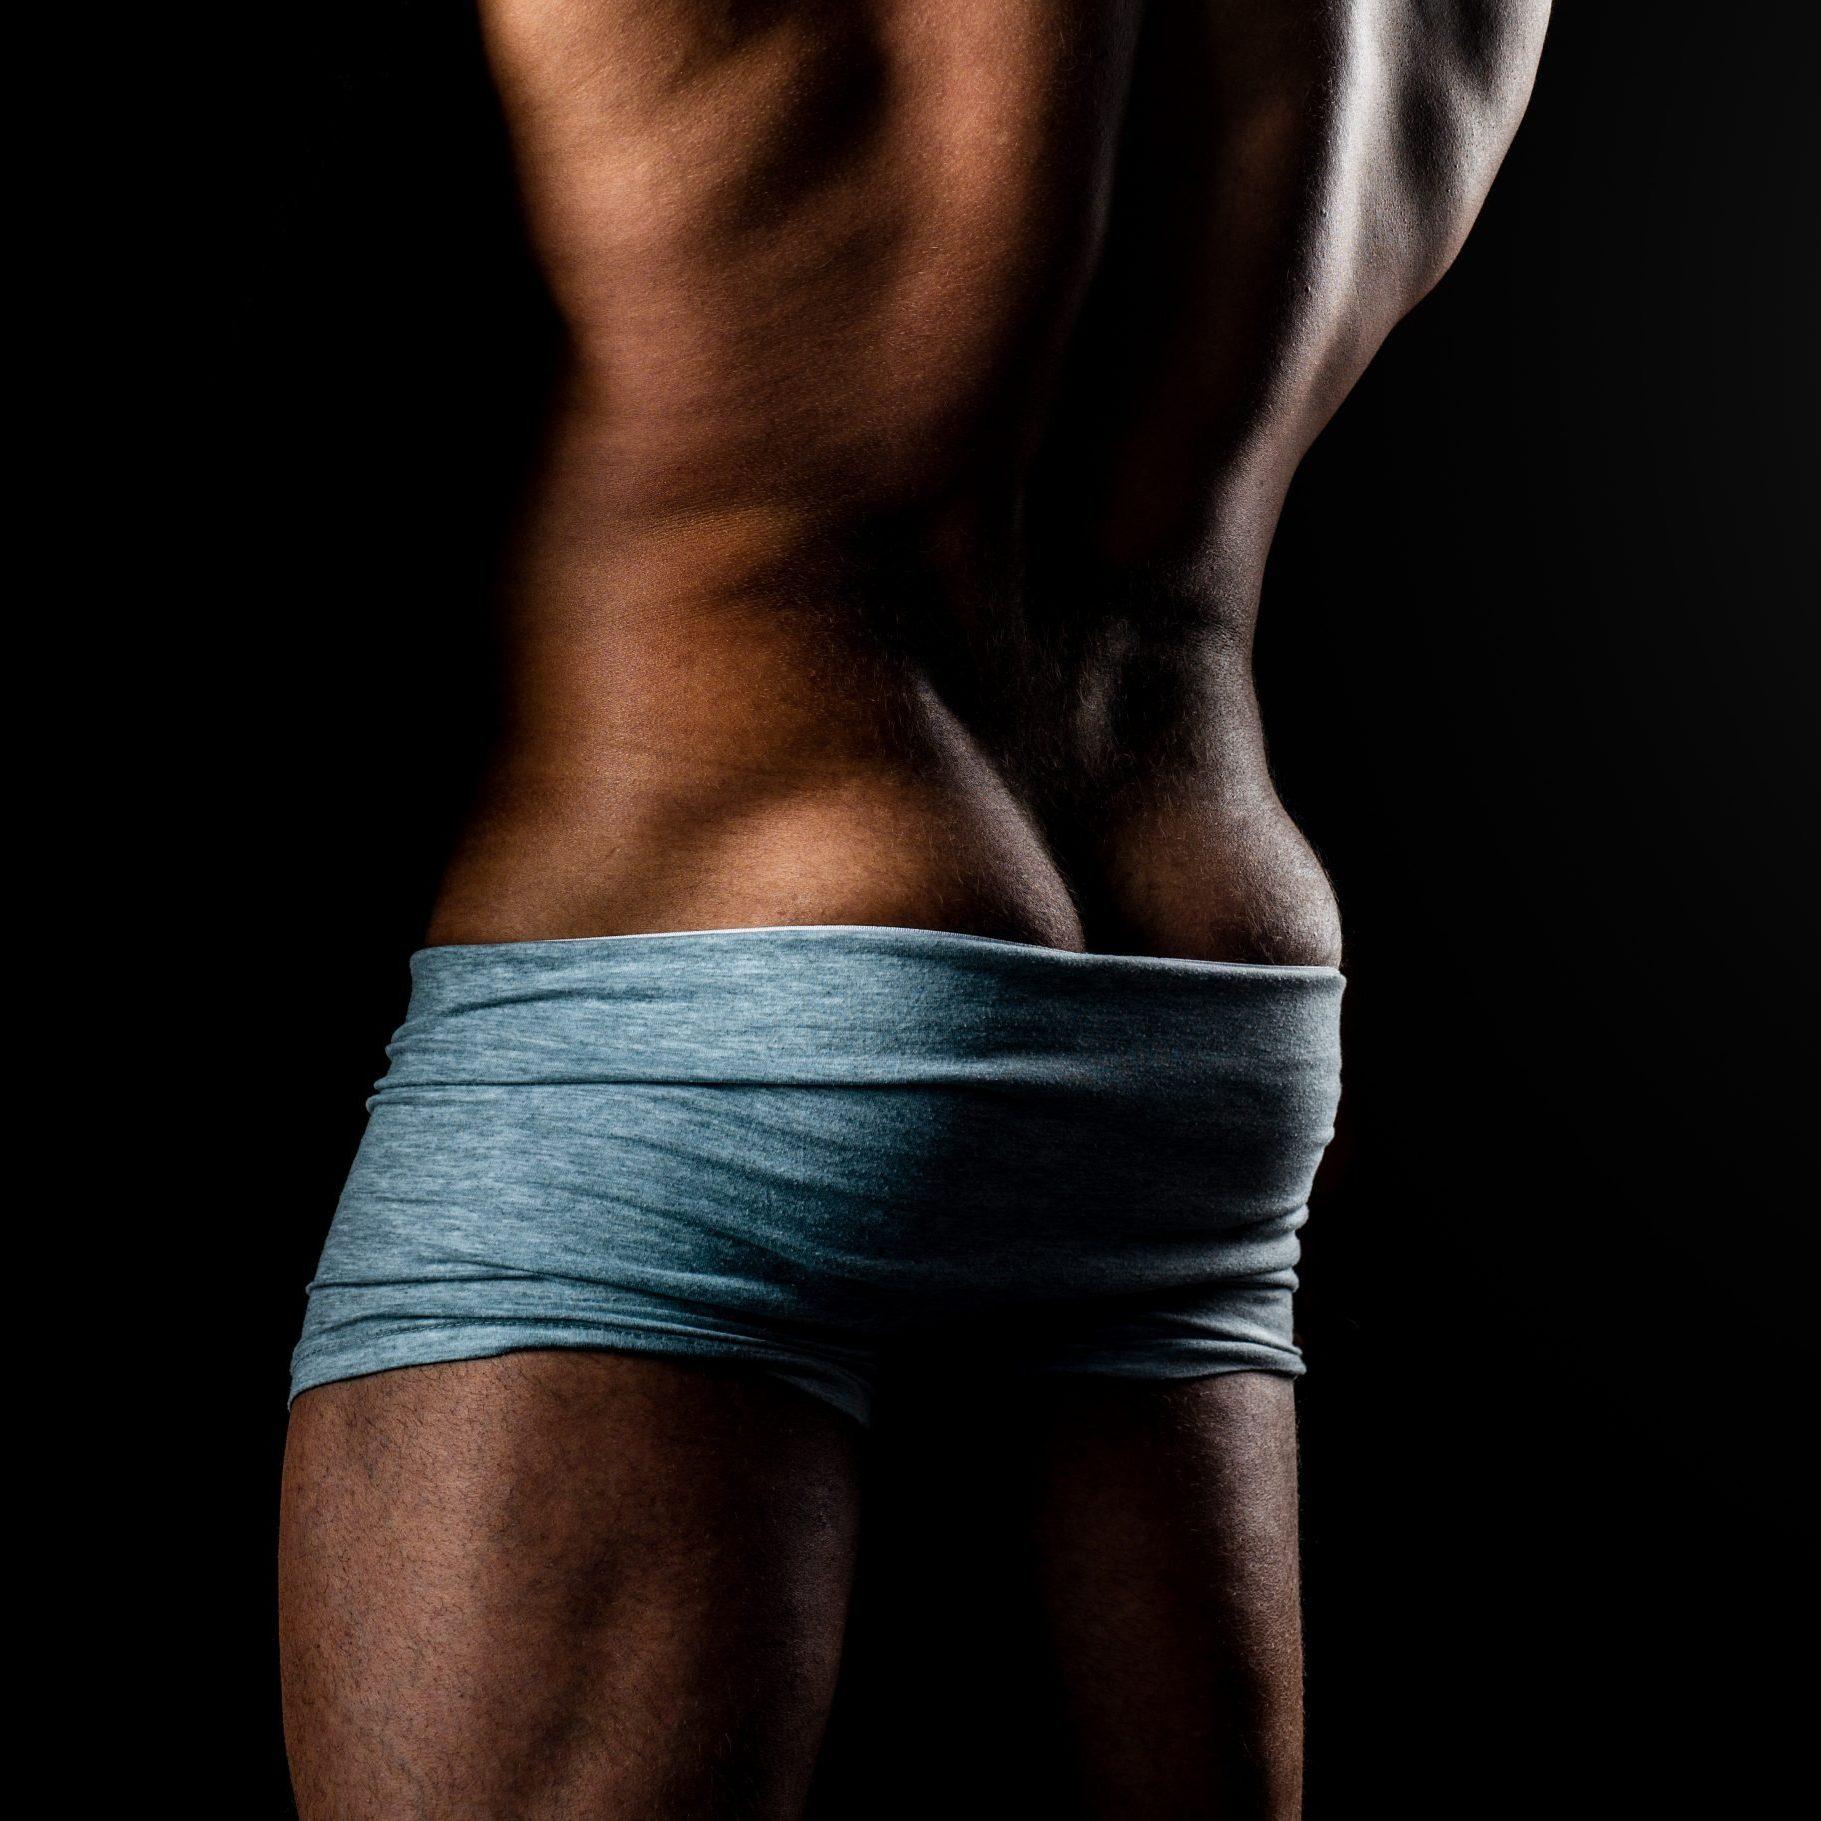 Muscular model man on dark background. Metrosexual concept. Nude torso. Topless male model. Man in underwear